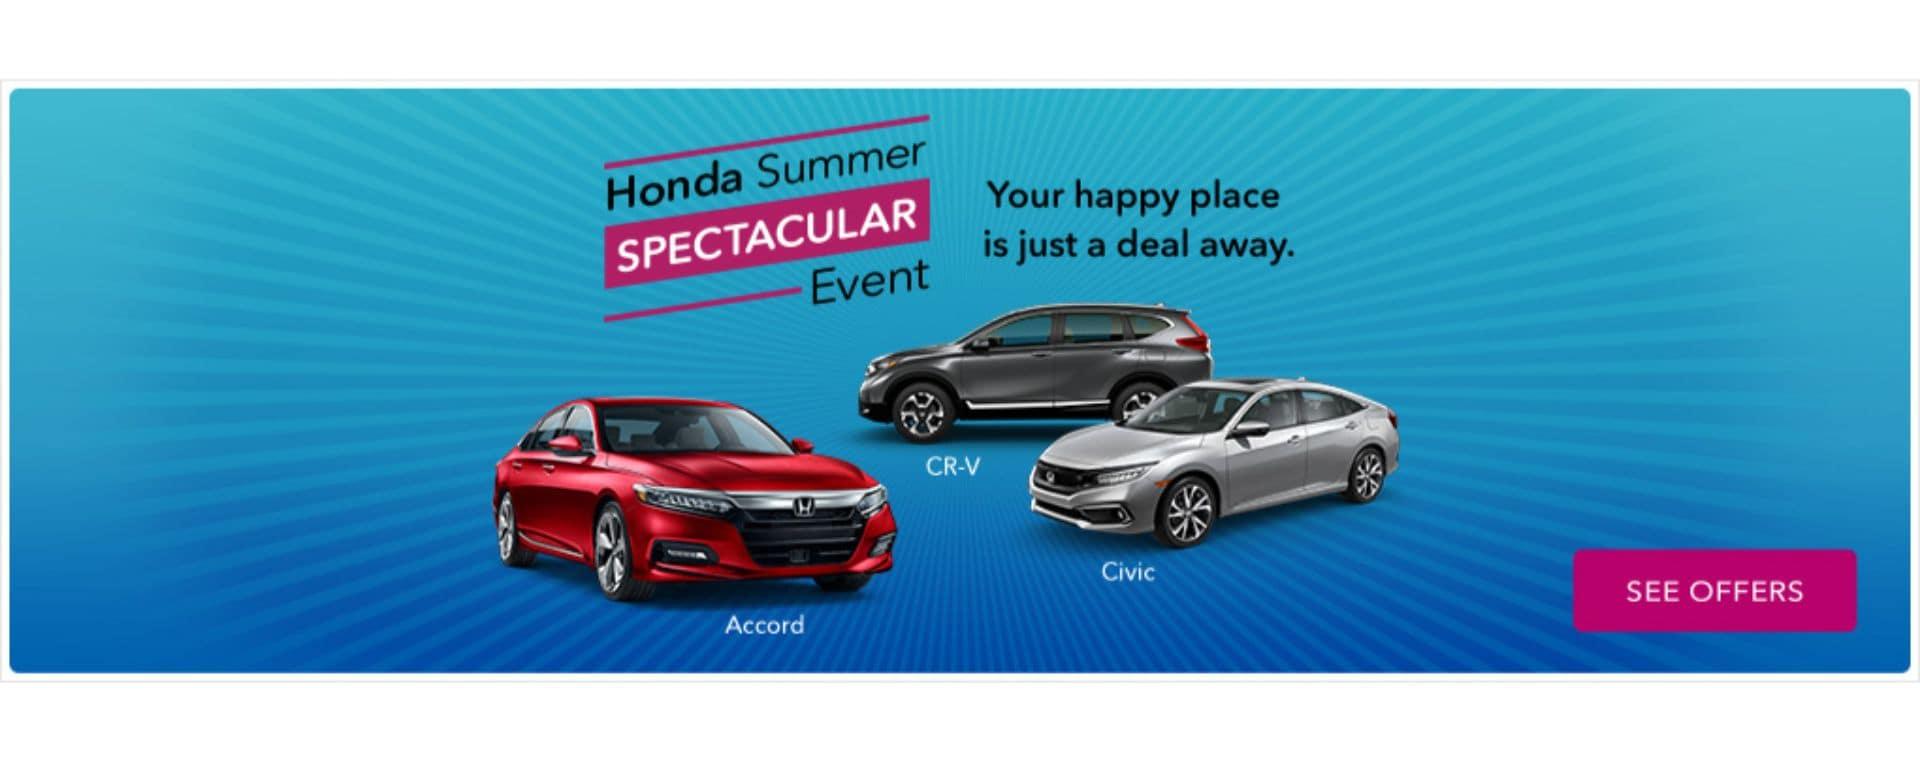 Jack O' Diamonds Honda   New & Used Honda Dealership in Tyler, TX